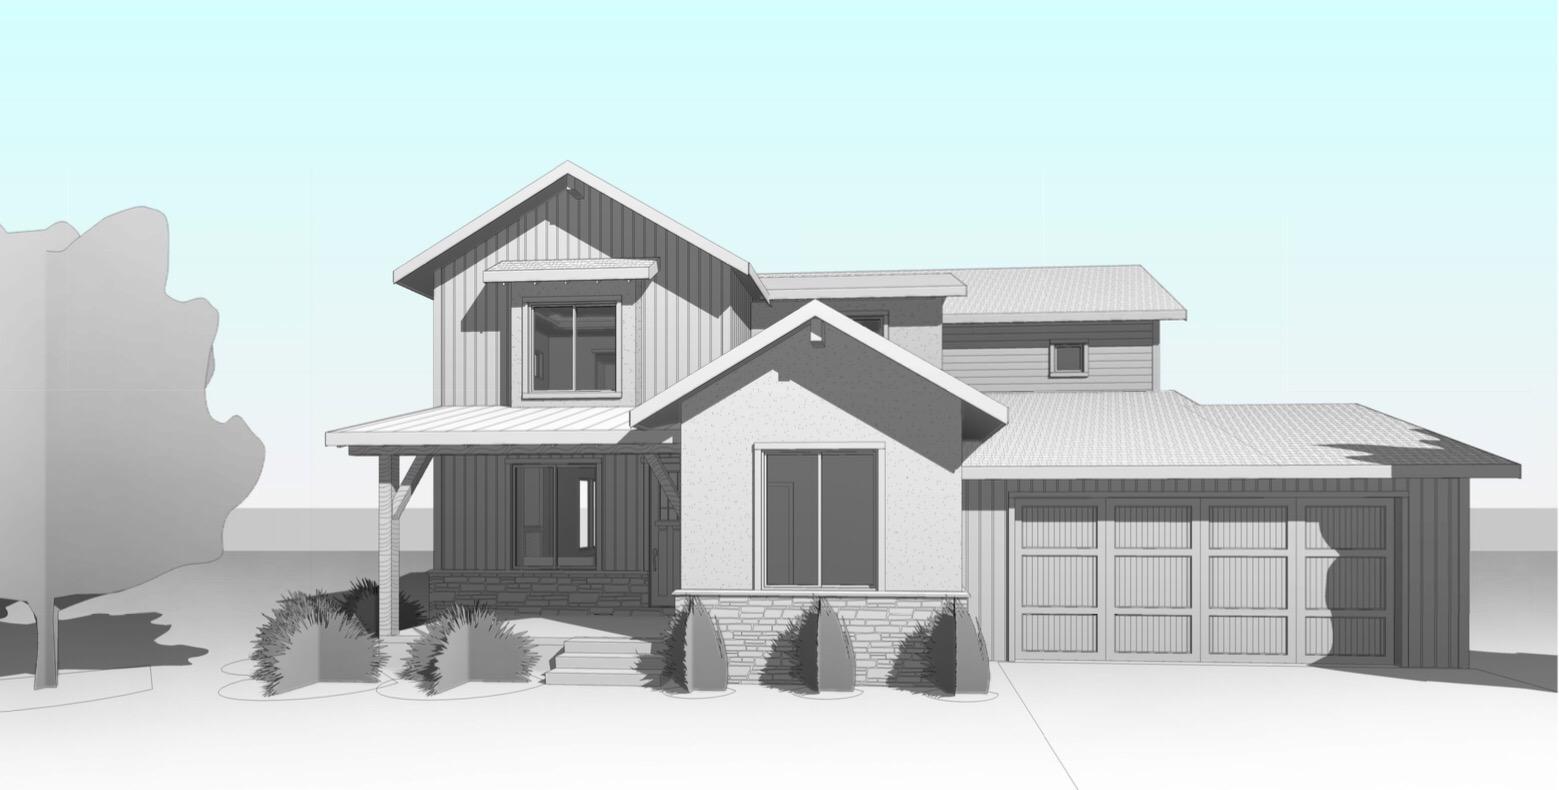 For Sale - 302 Pinyon St, Frederick $395,000 Three Bedroom | Three Bath | Three Car Tandem Garage | To Be Built